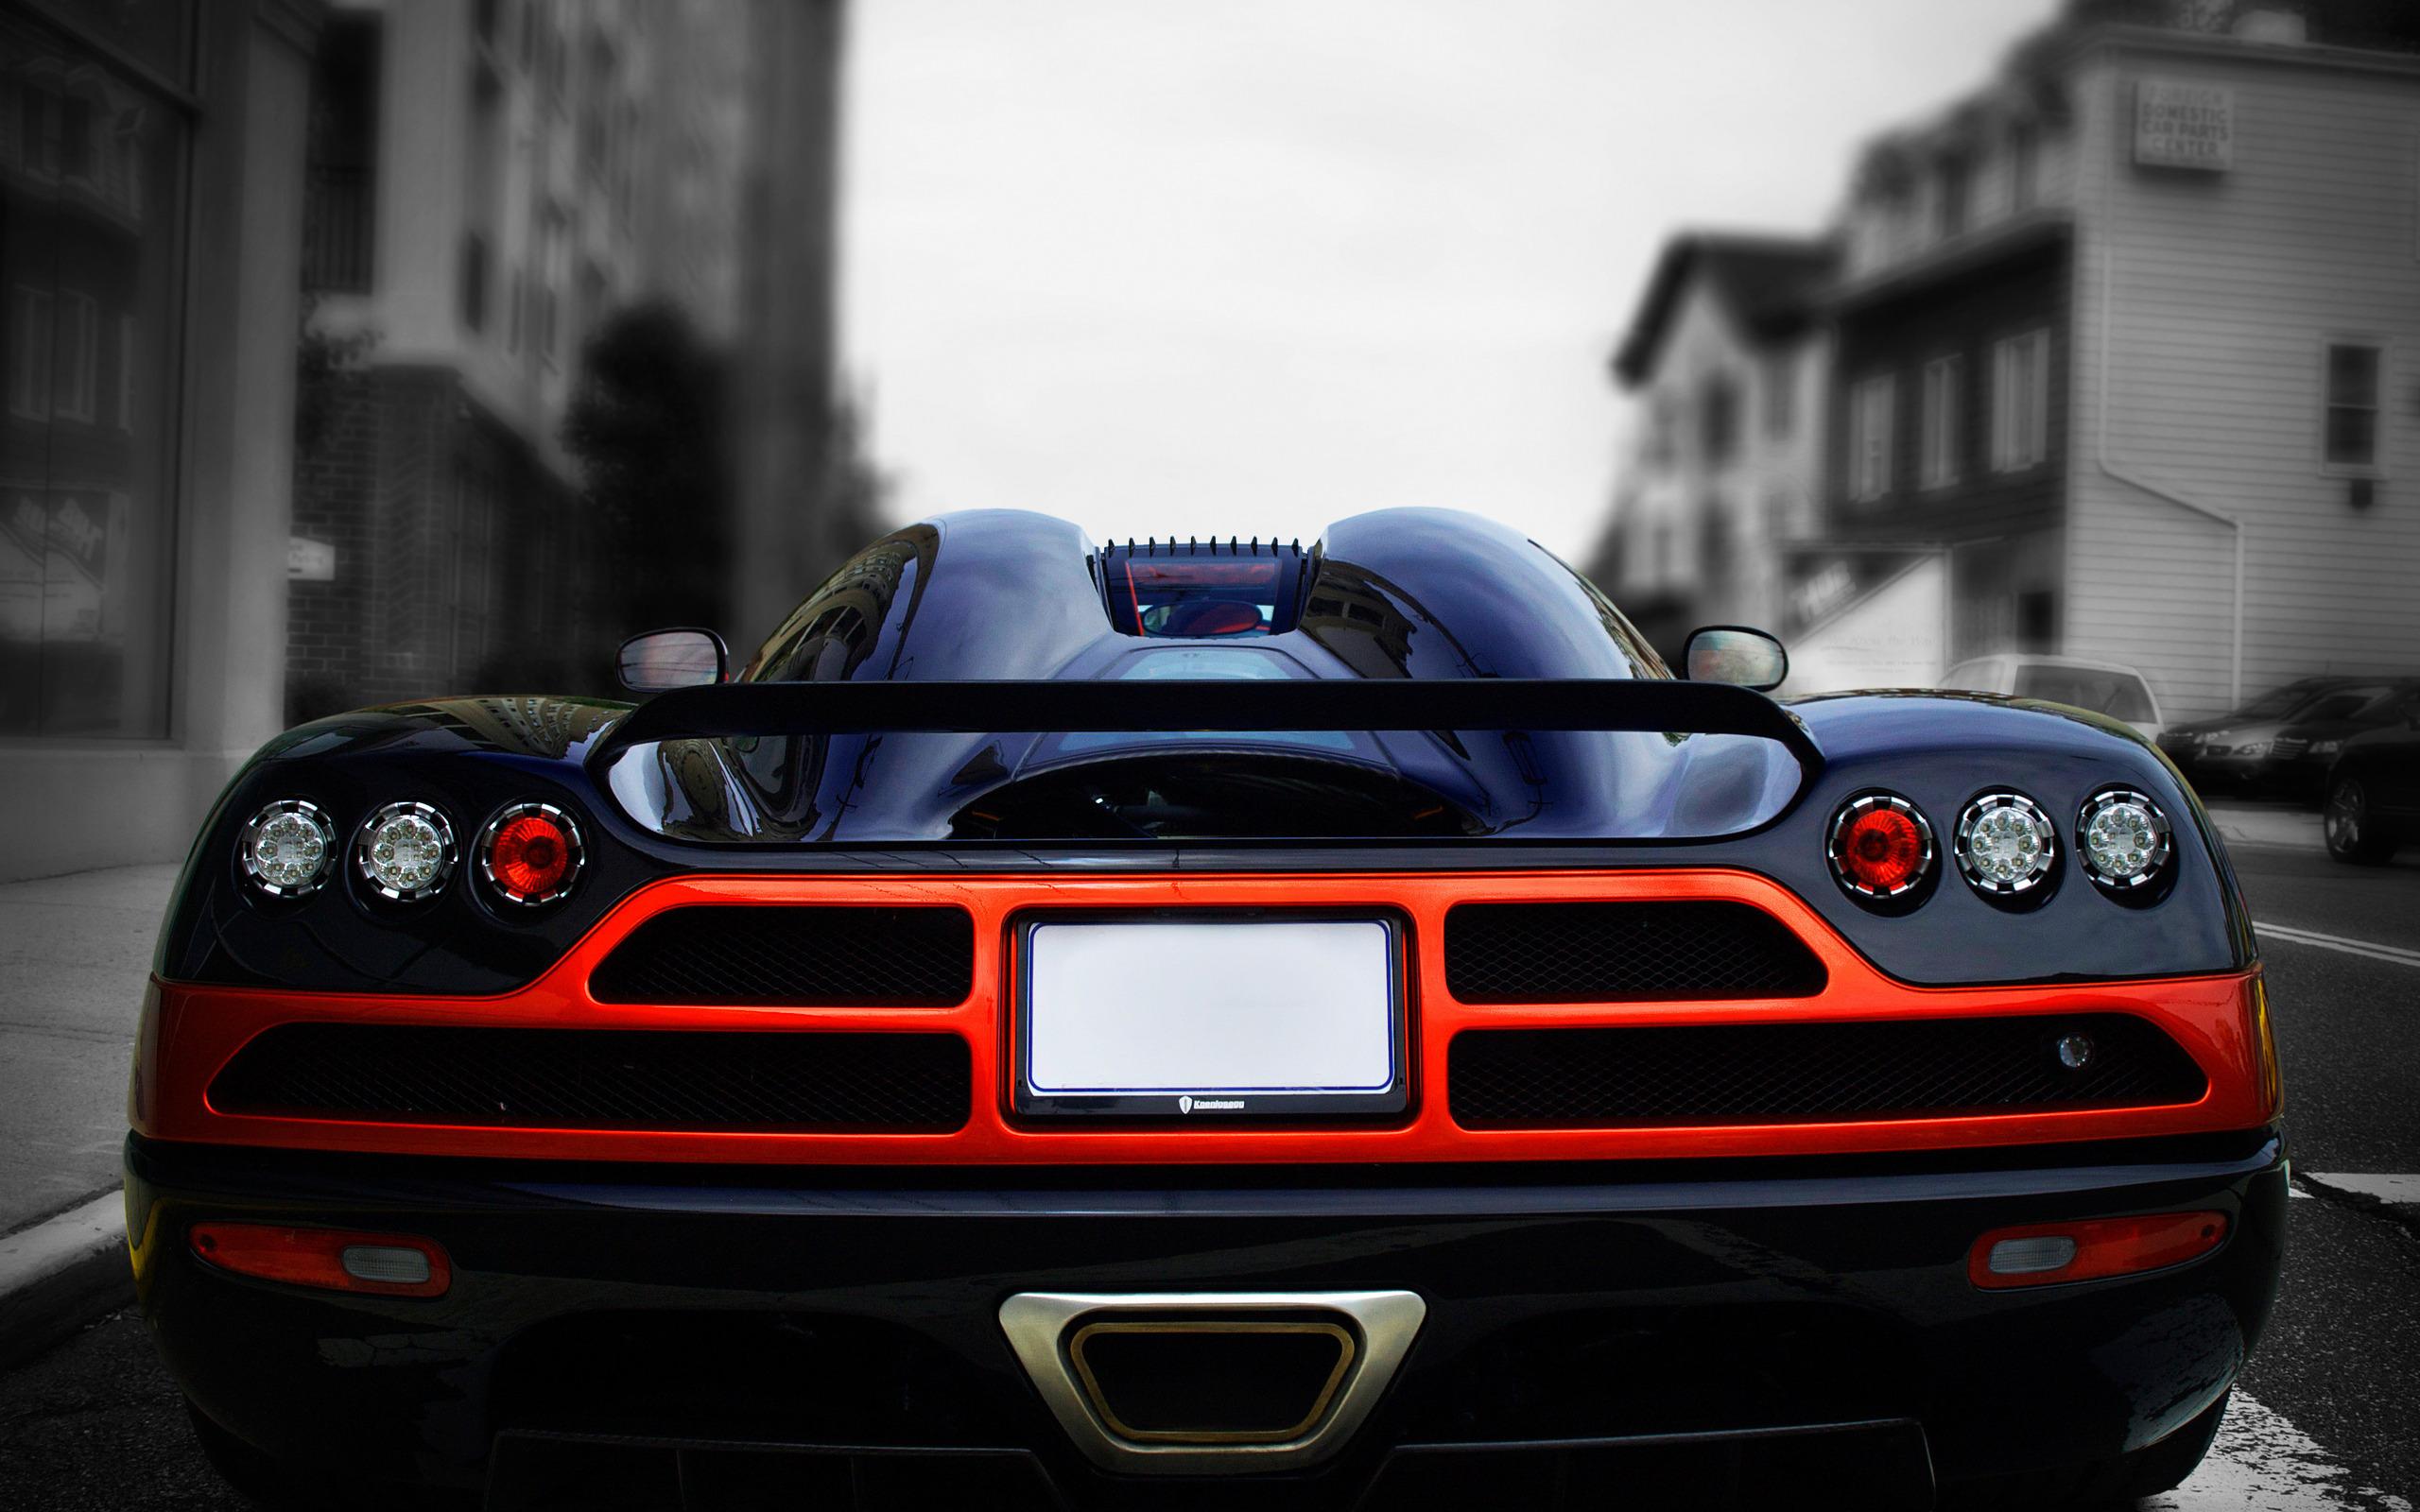 Wallpaper : Blue Cars, Selective Coloring, Supercars, Super Car, Sports Car,  Aston Martin DBS, Koenigsegg CCX, Performance Car, Koenigsegg CCR,  Supercar, ...